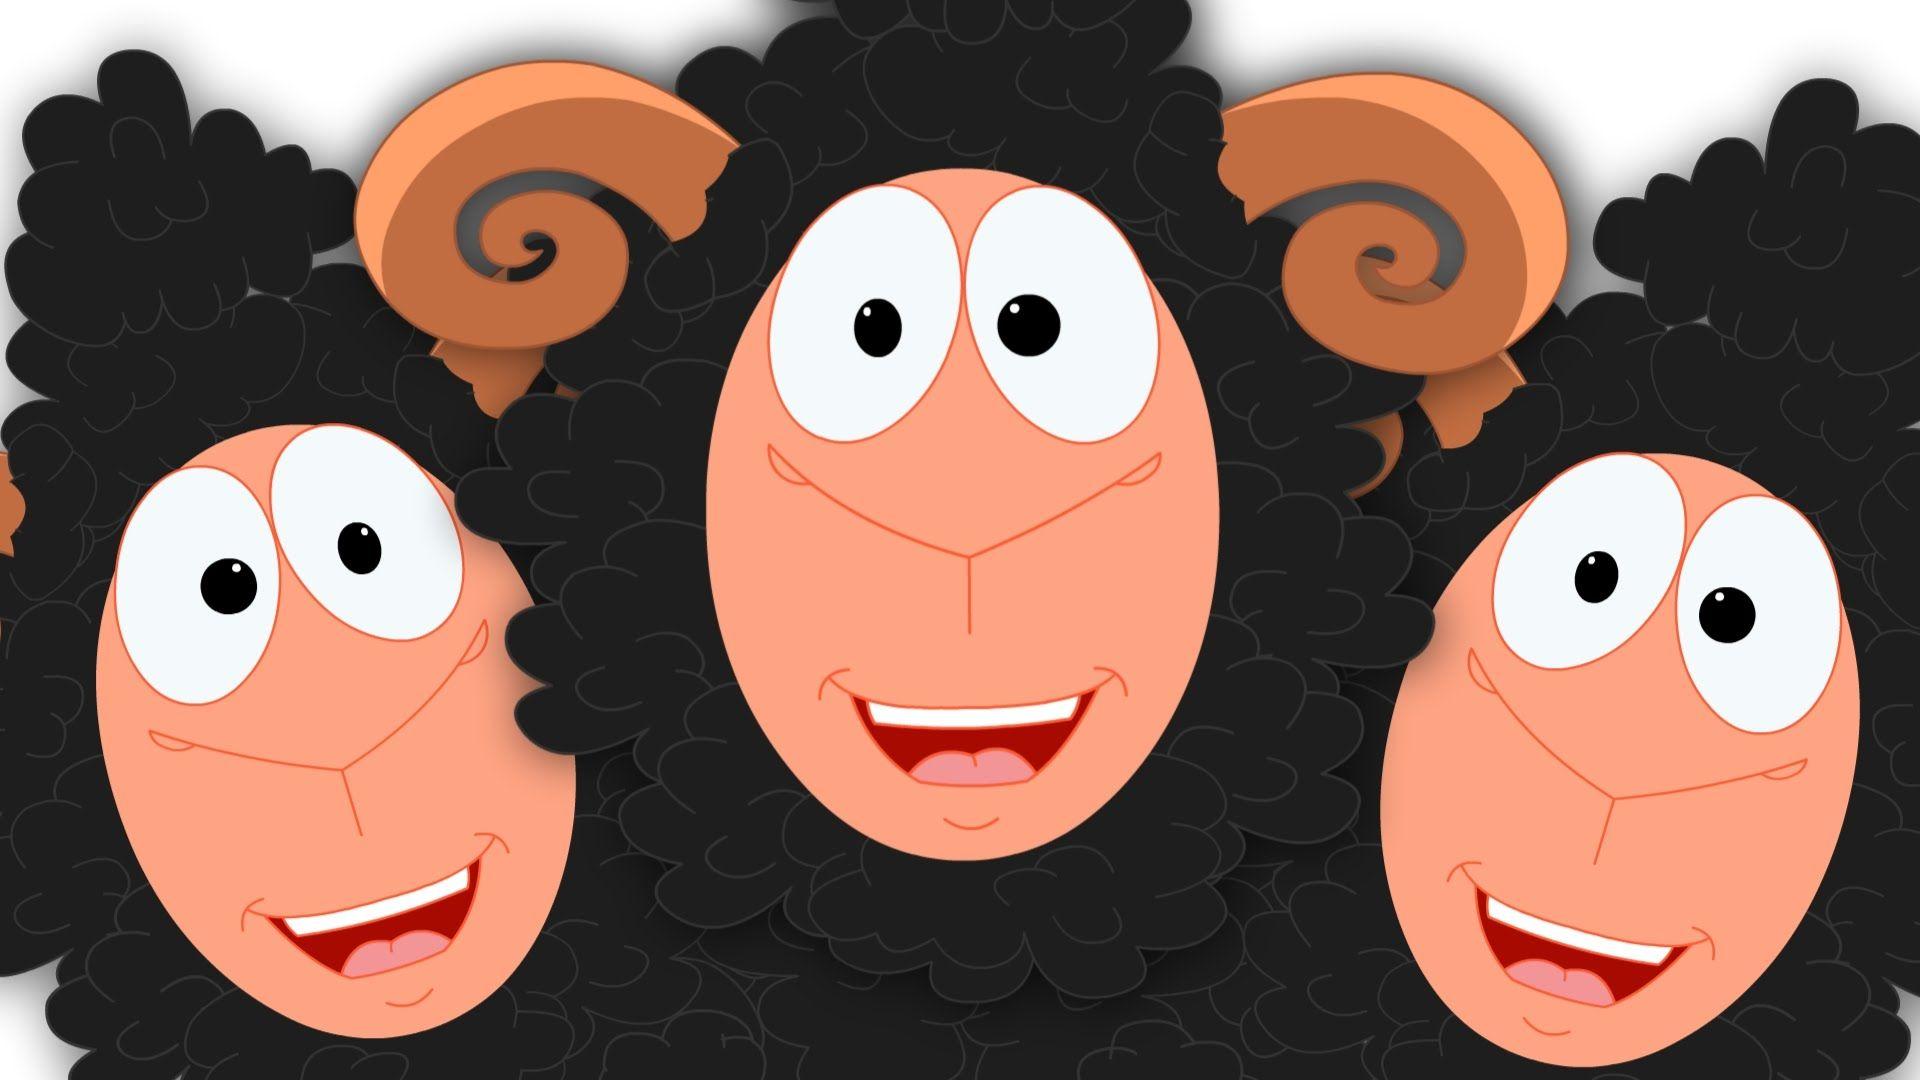 Let S Ask Baa Baa Black Sheep The Classic Question Through